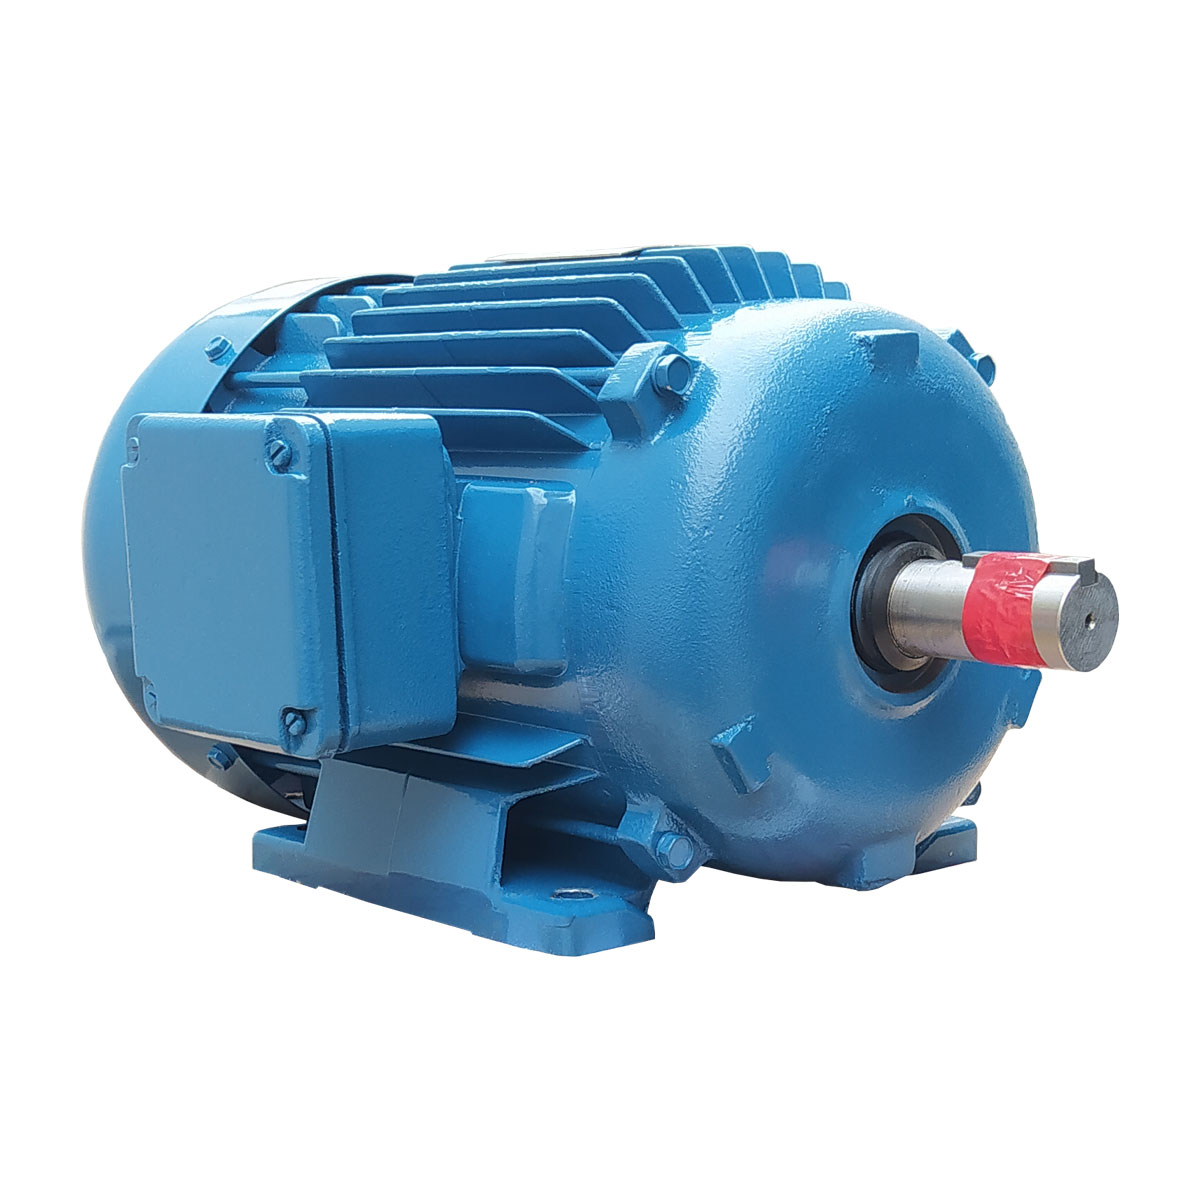 Motor Elétrico Trifásico 5cv Alta Rotação 3480 Rpm 2 Polos Eberle Mercosul